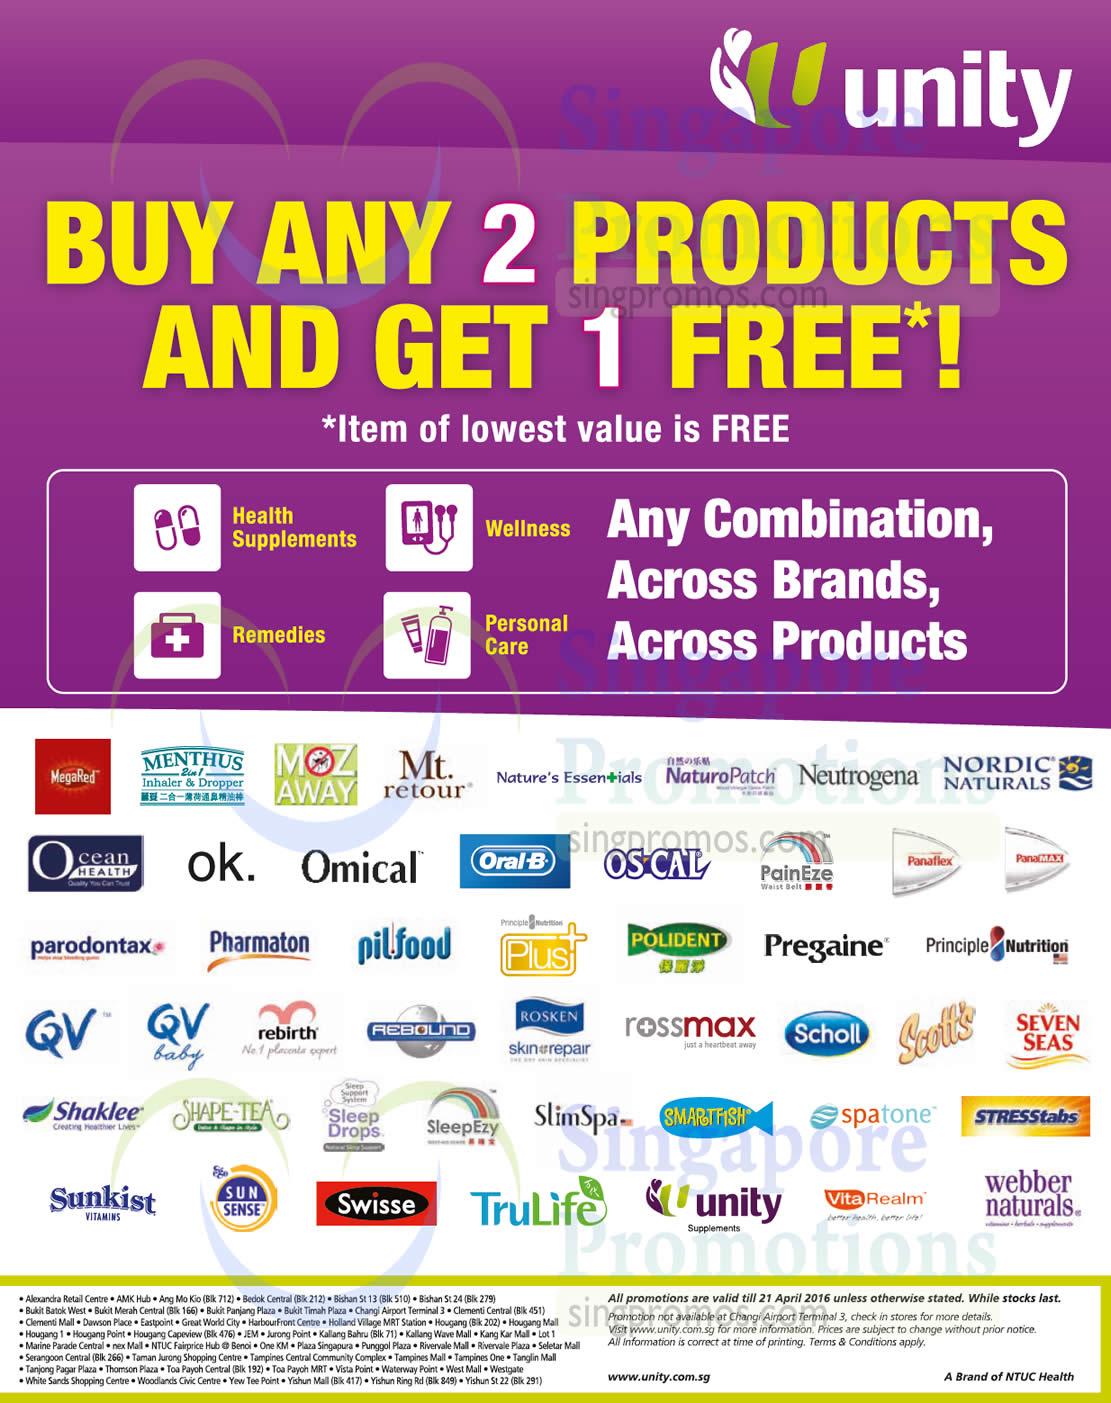 Categories, Participating Brands, Retail Outlets